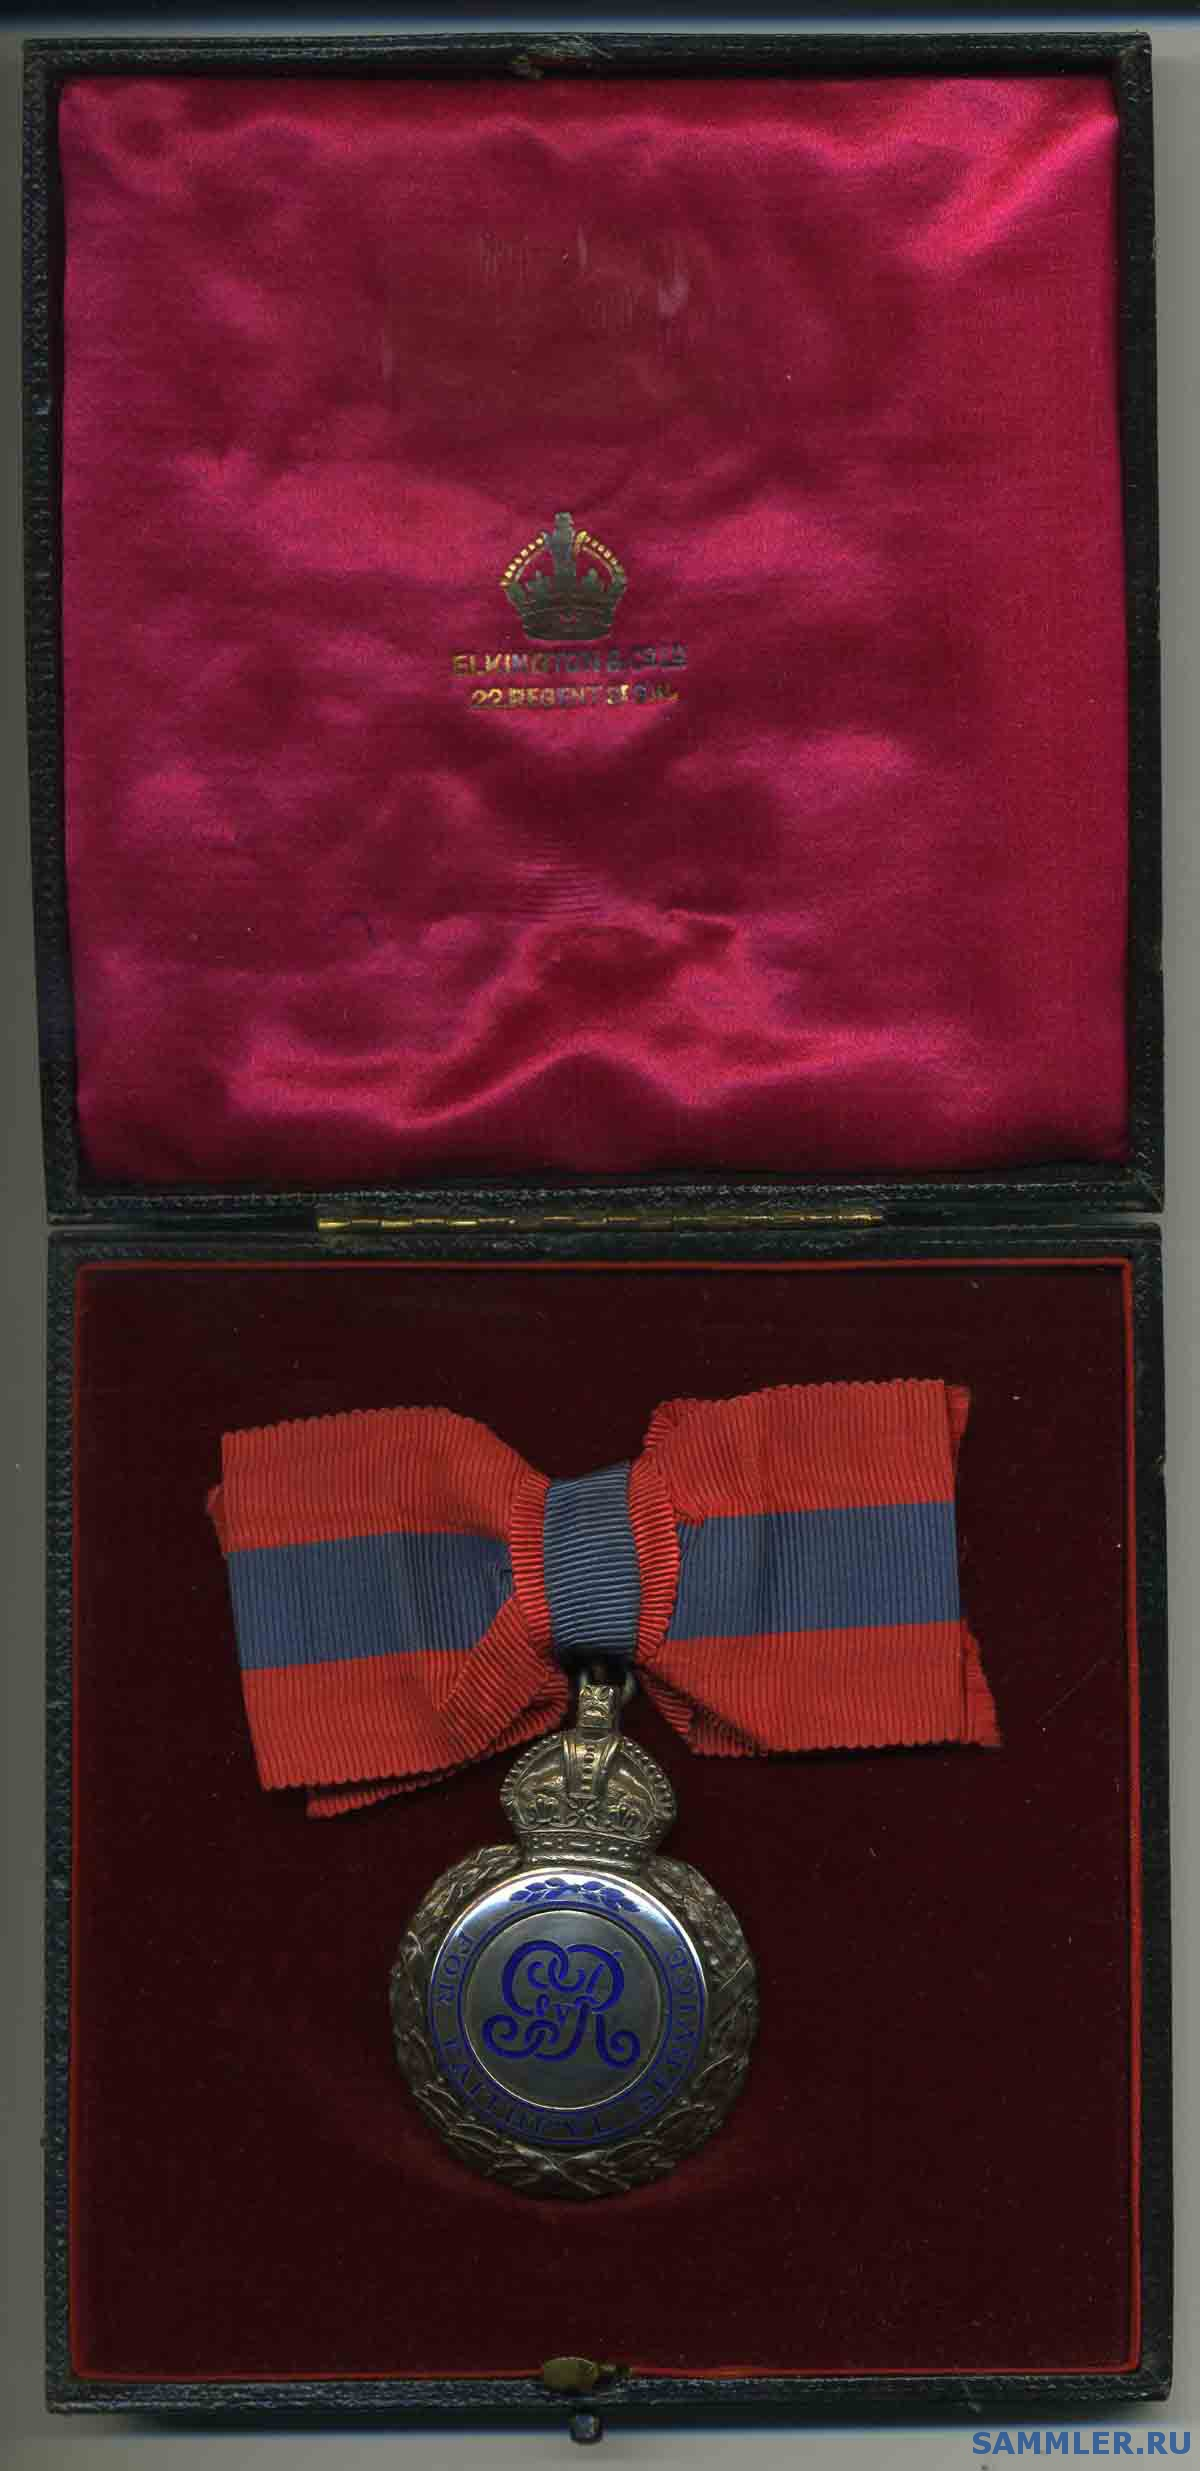 Imperial_Service_Medal_d.jpg